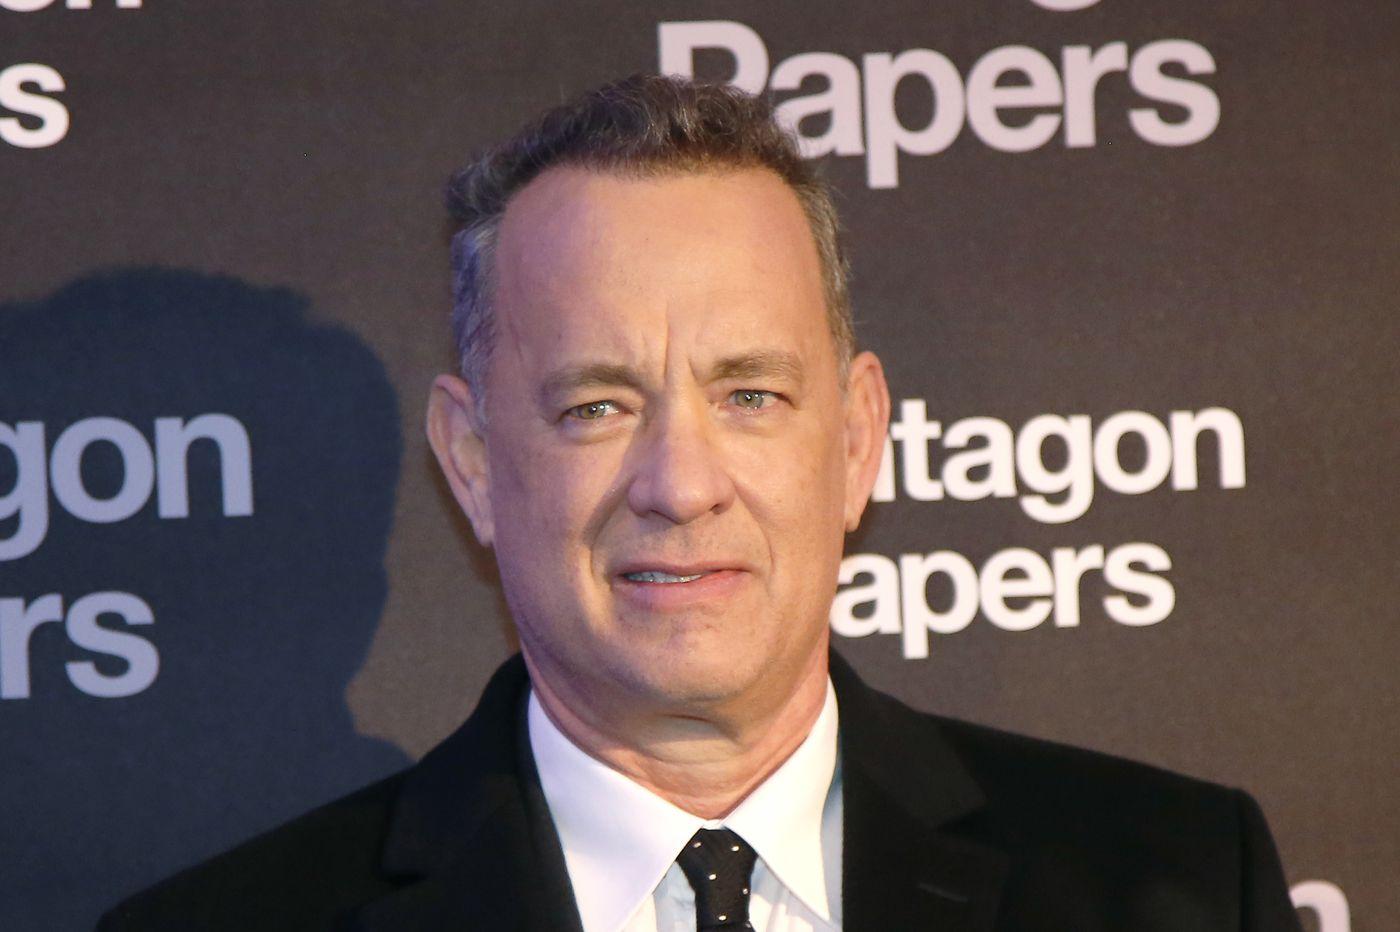 Tom Hanks surprises woman by singing 'Happy Birthday'